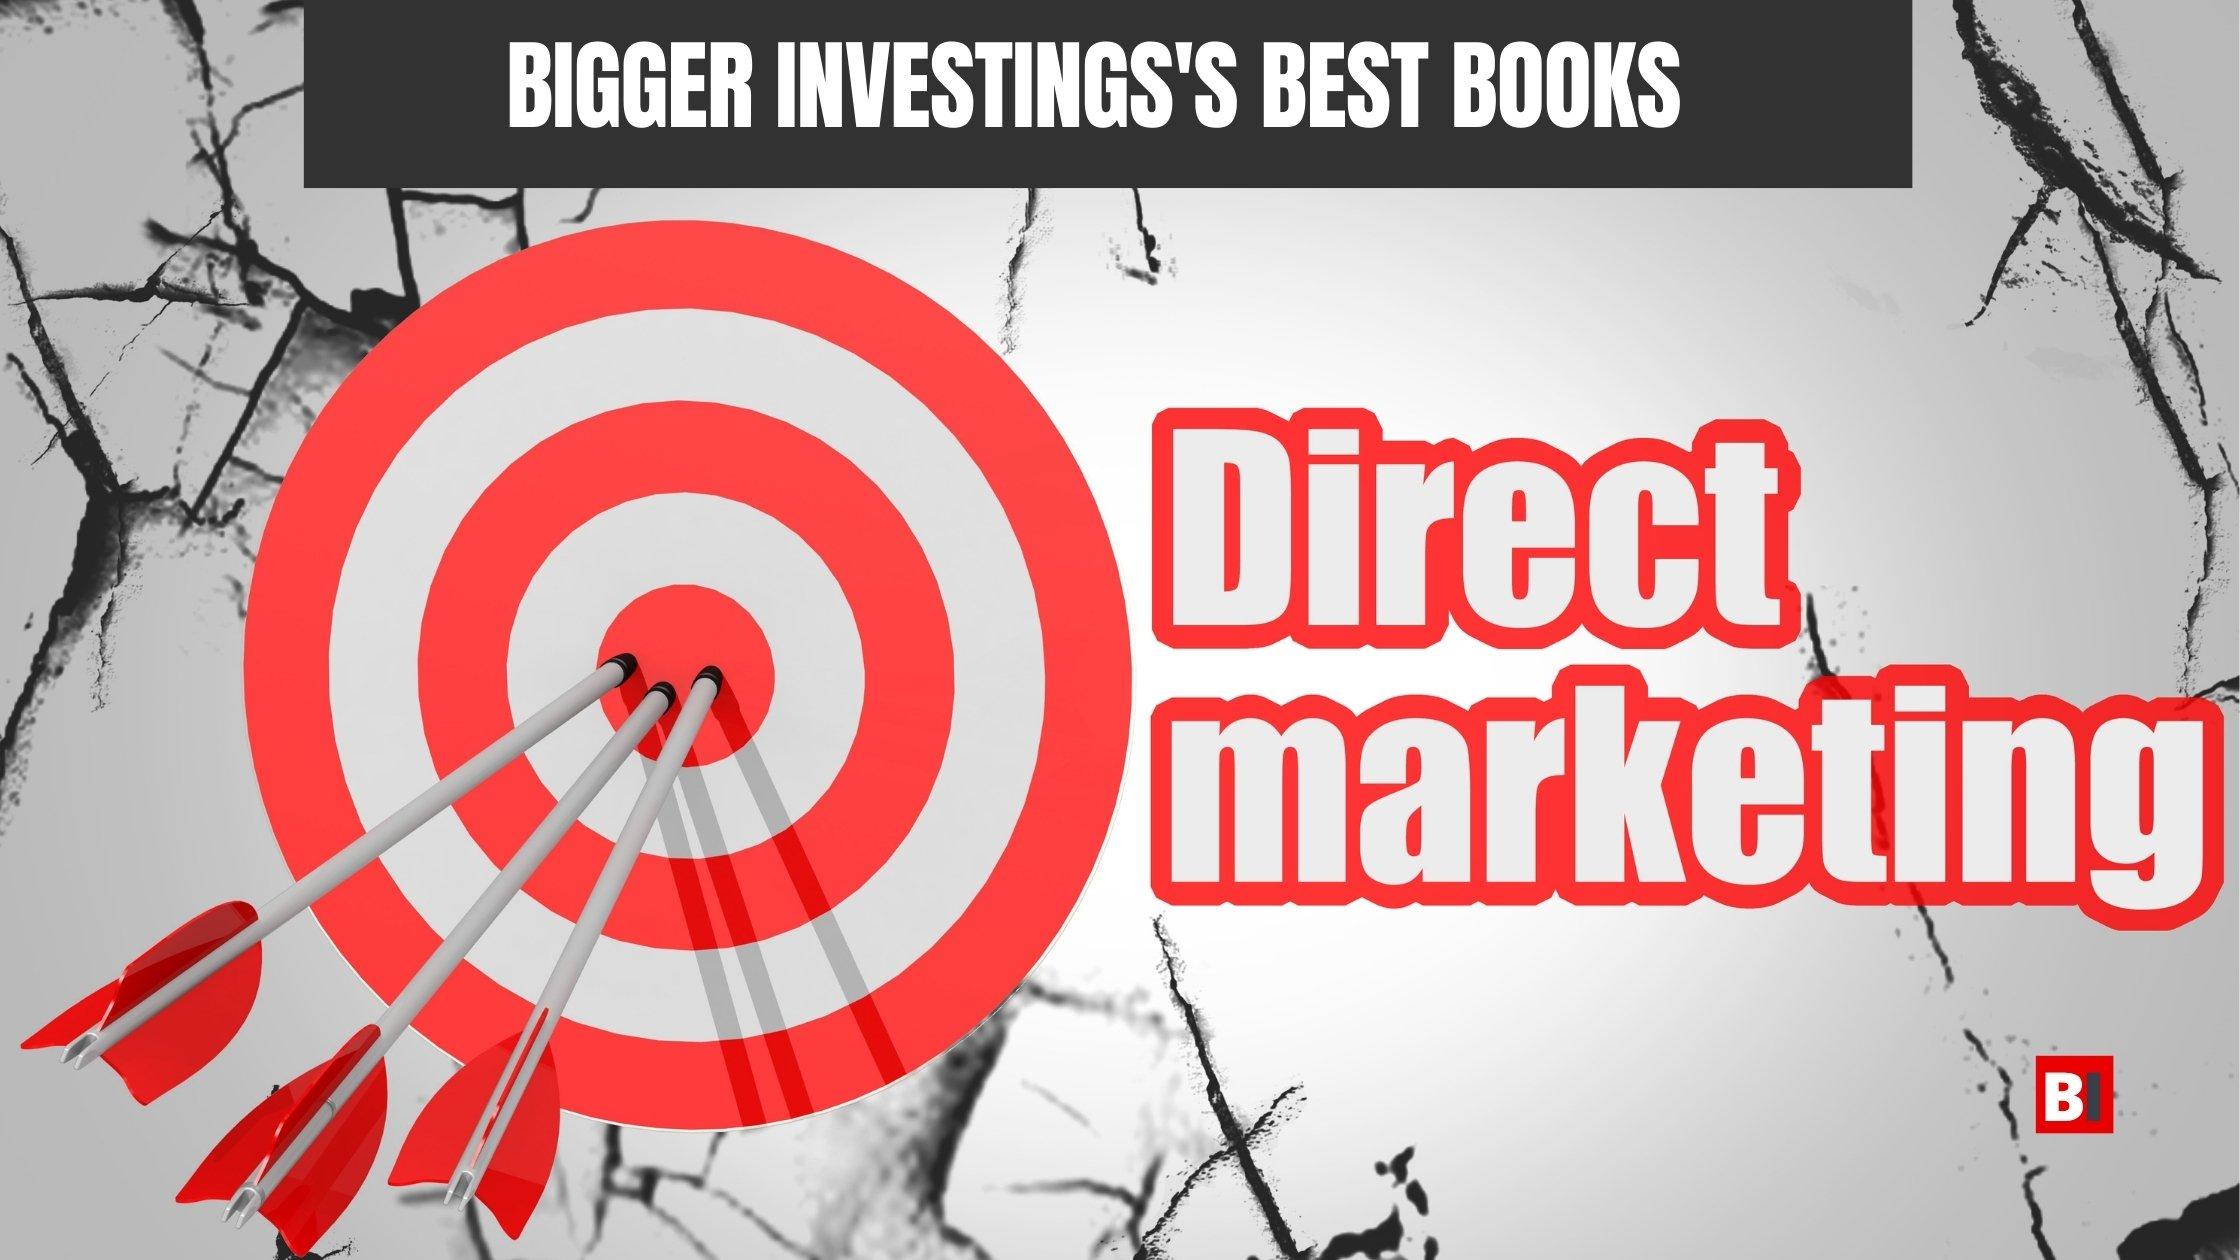 Best Books on Direct Marketing